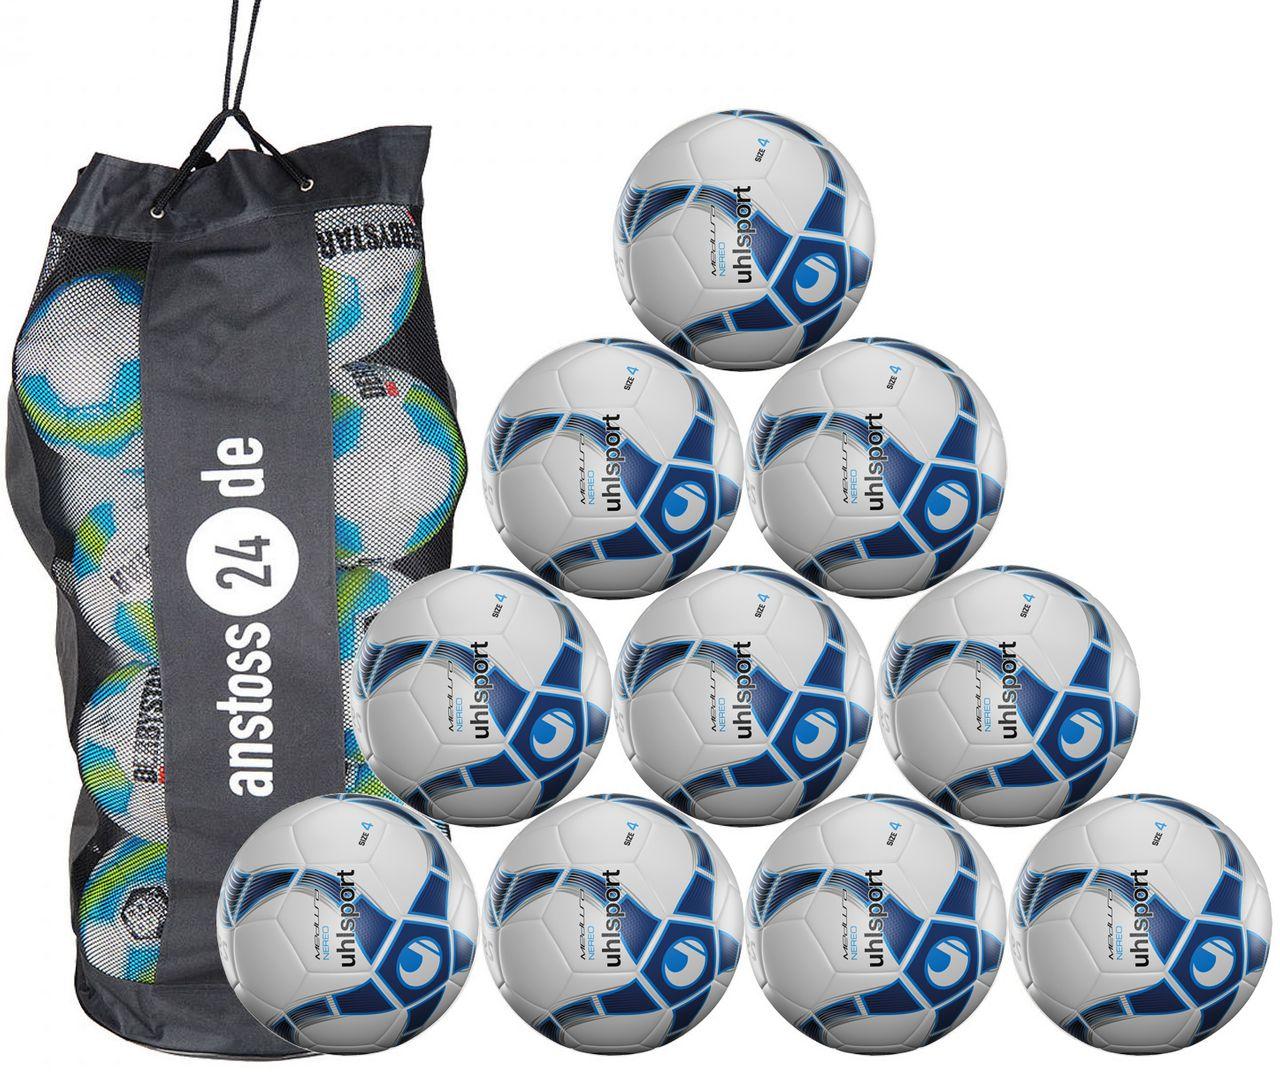 10 x Uhlsport Training Ball Futsal - MEDUSA NEREO incl. ball bag